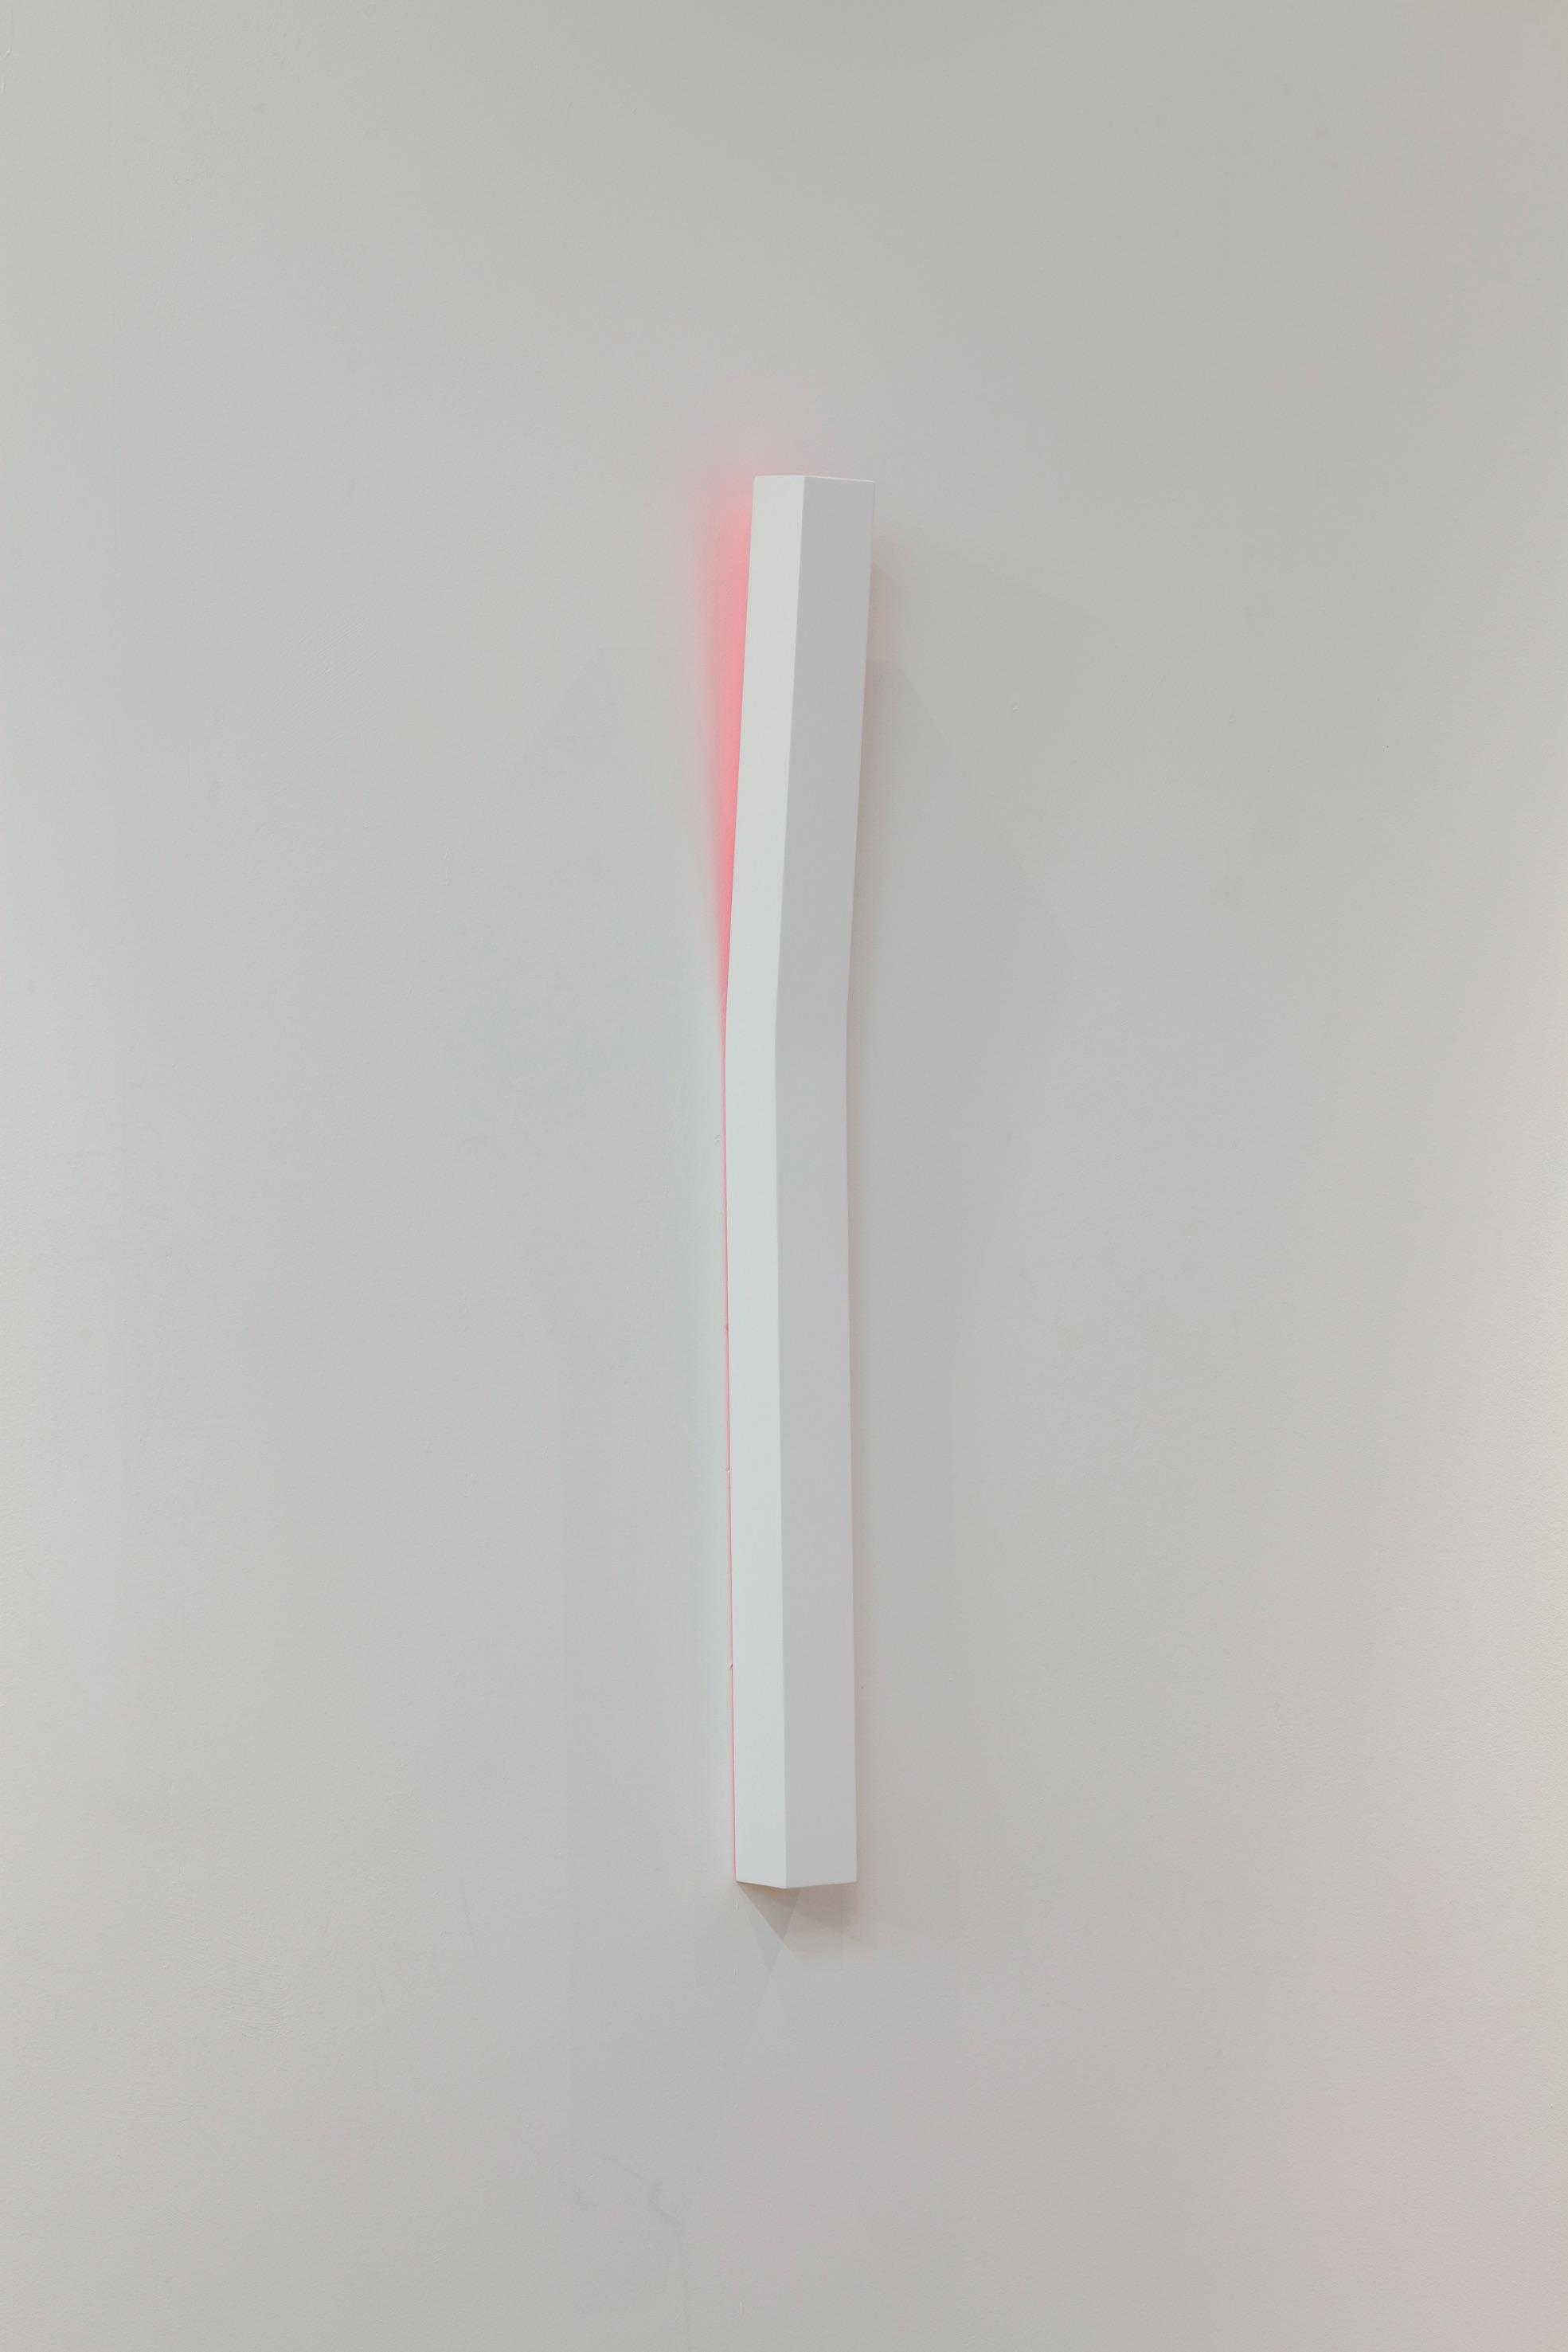 Player, 2013 Prem Sahib London artist minimalism club culture